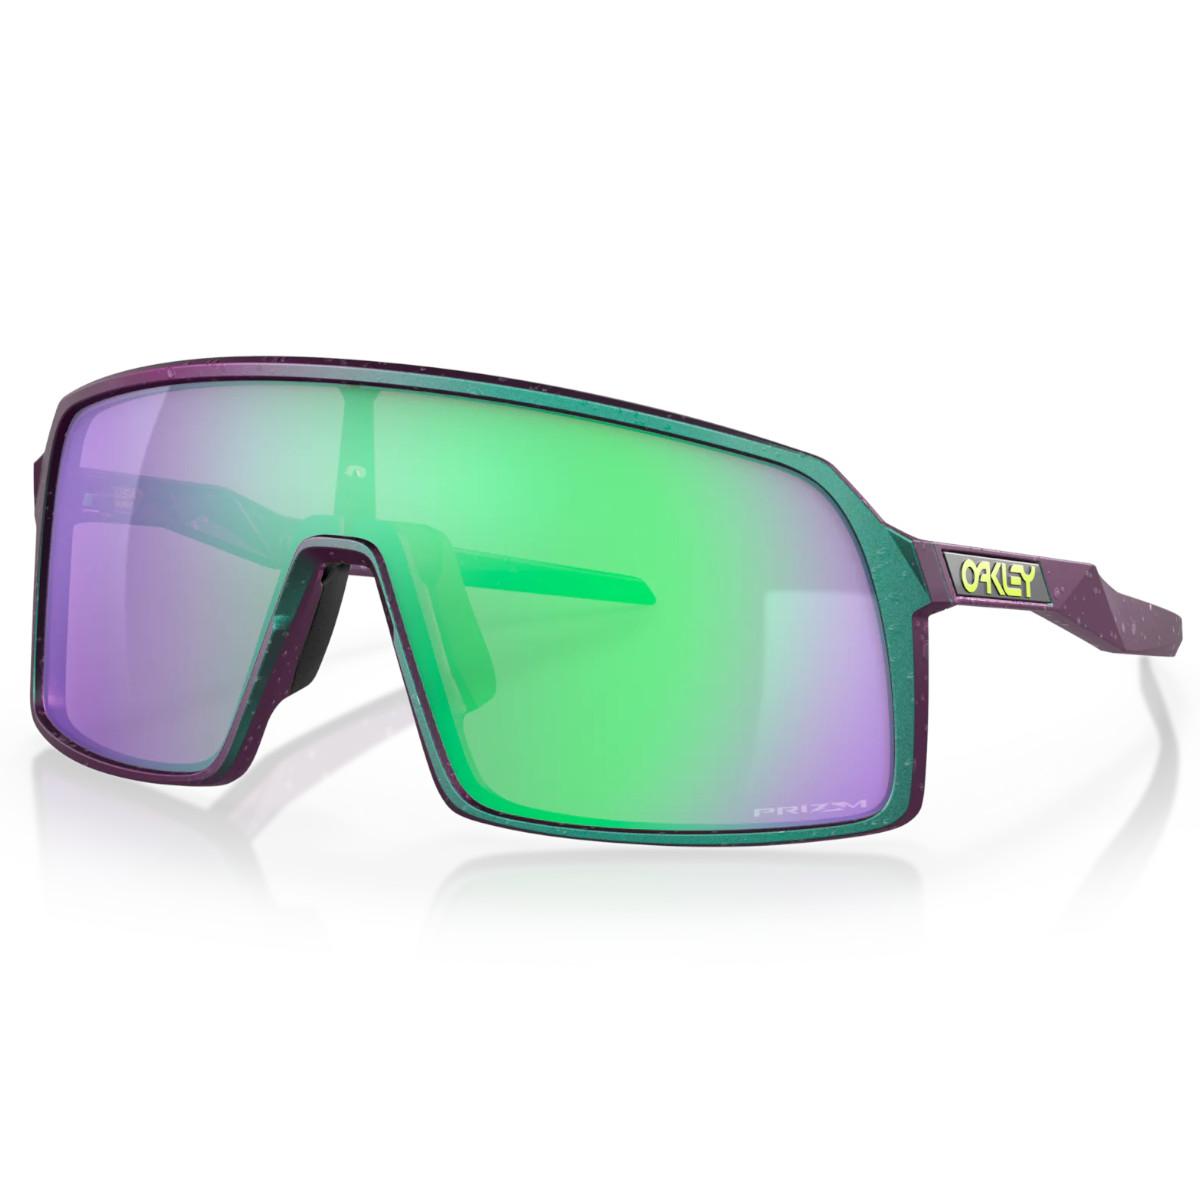 Óculos Oakley Sutro Edição Limitada Odyssey Prizm Road Jade